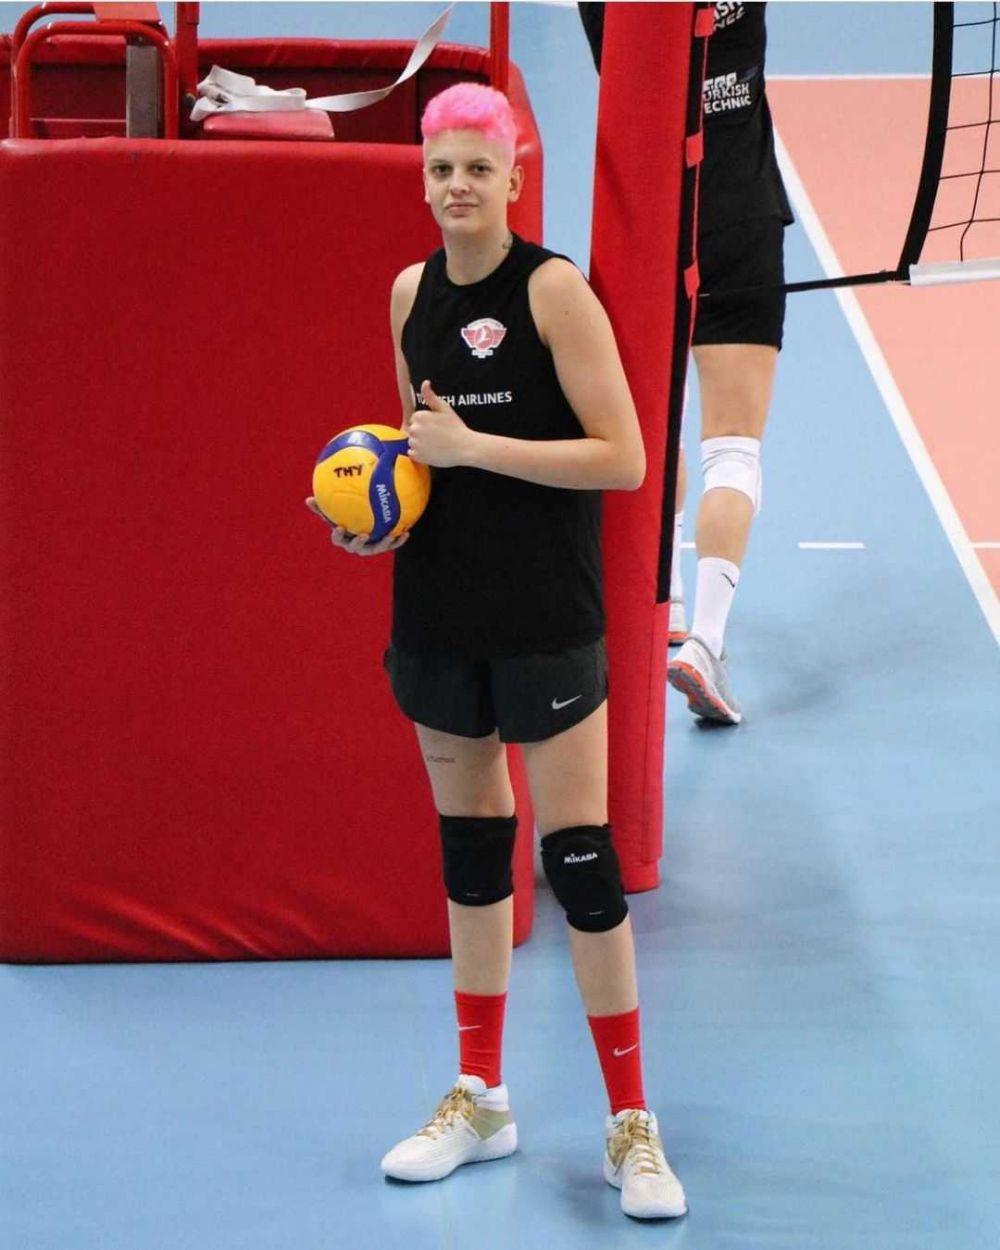 10 Potret Ebrar Karakurt, Atlet Voli Berambut Pink yang Curi Perhatian